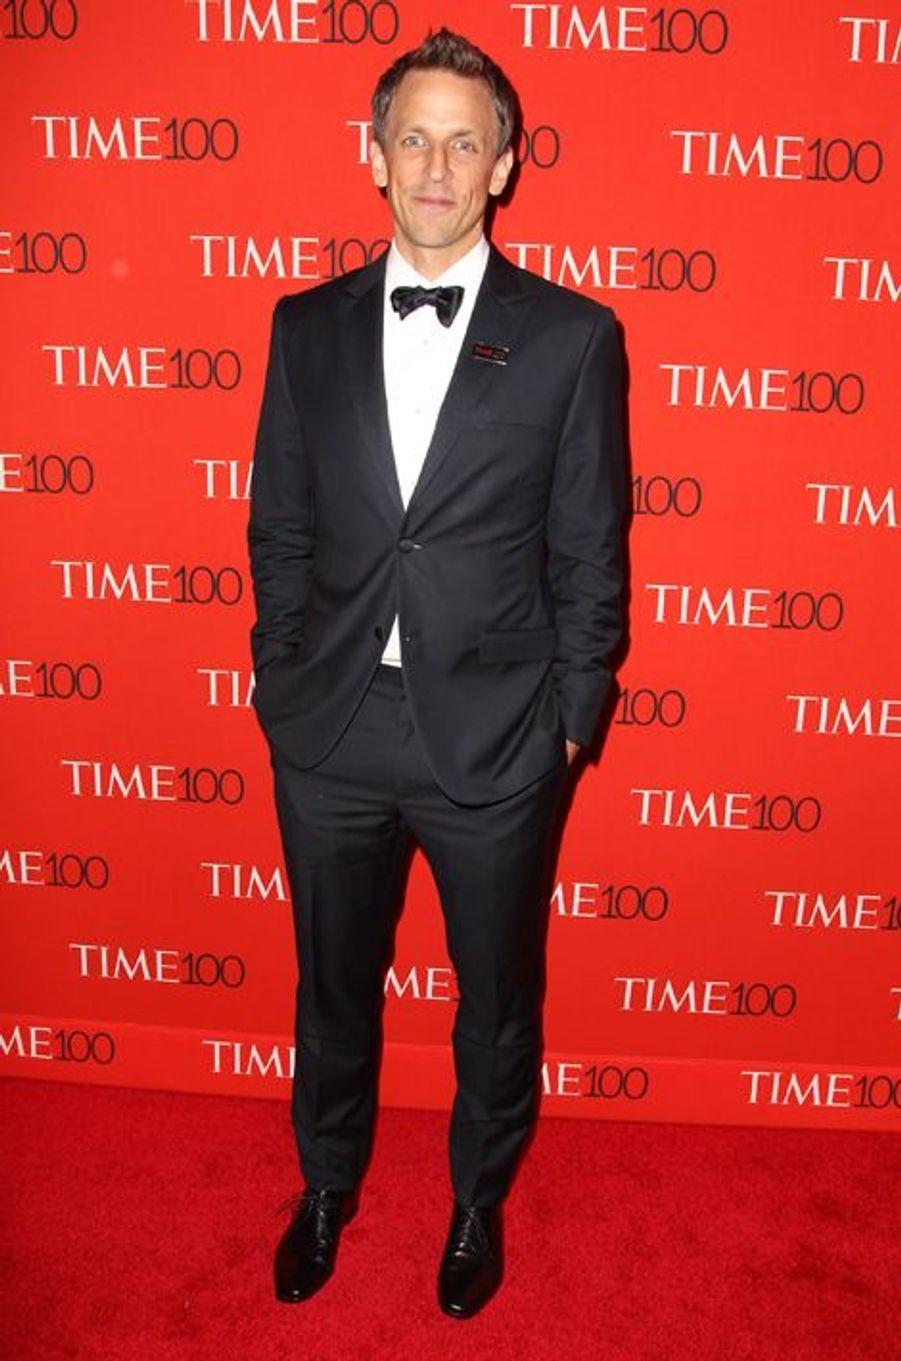 Seth Meyers à New York le 21 avril 2015